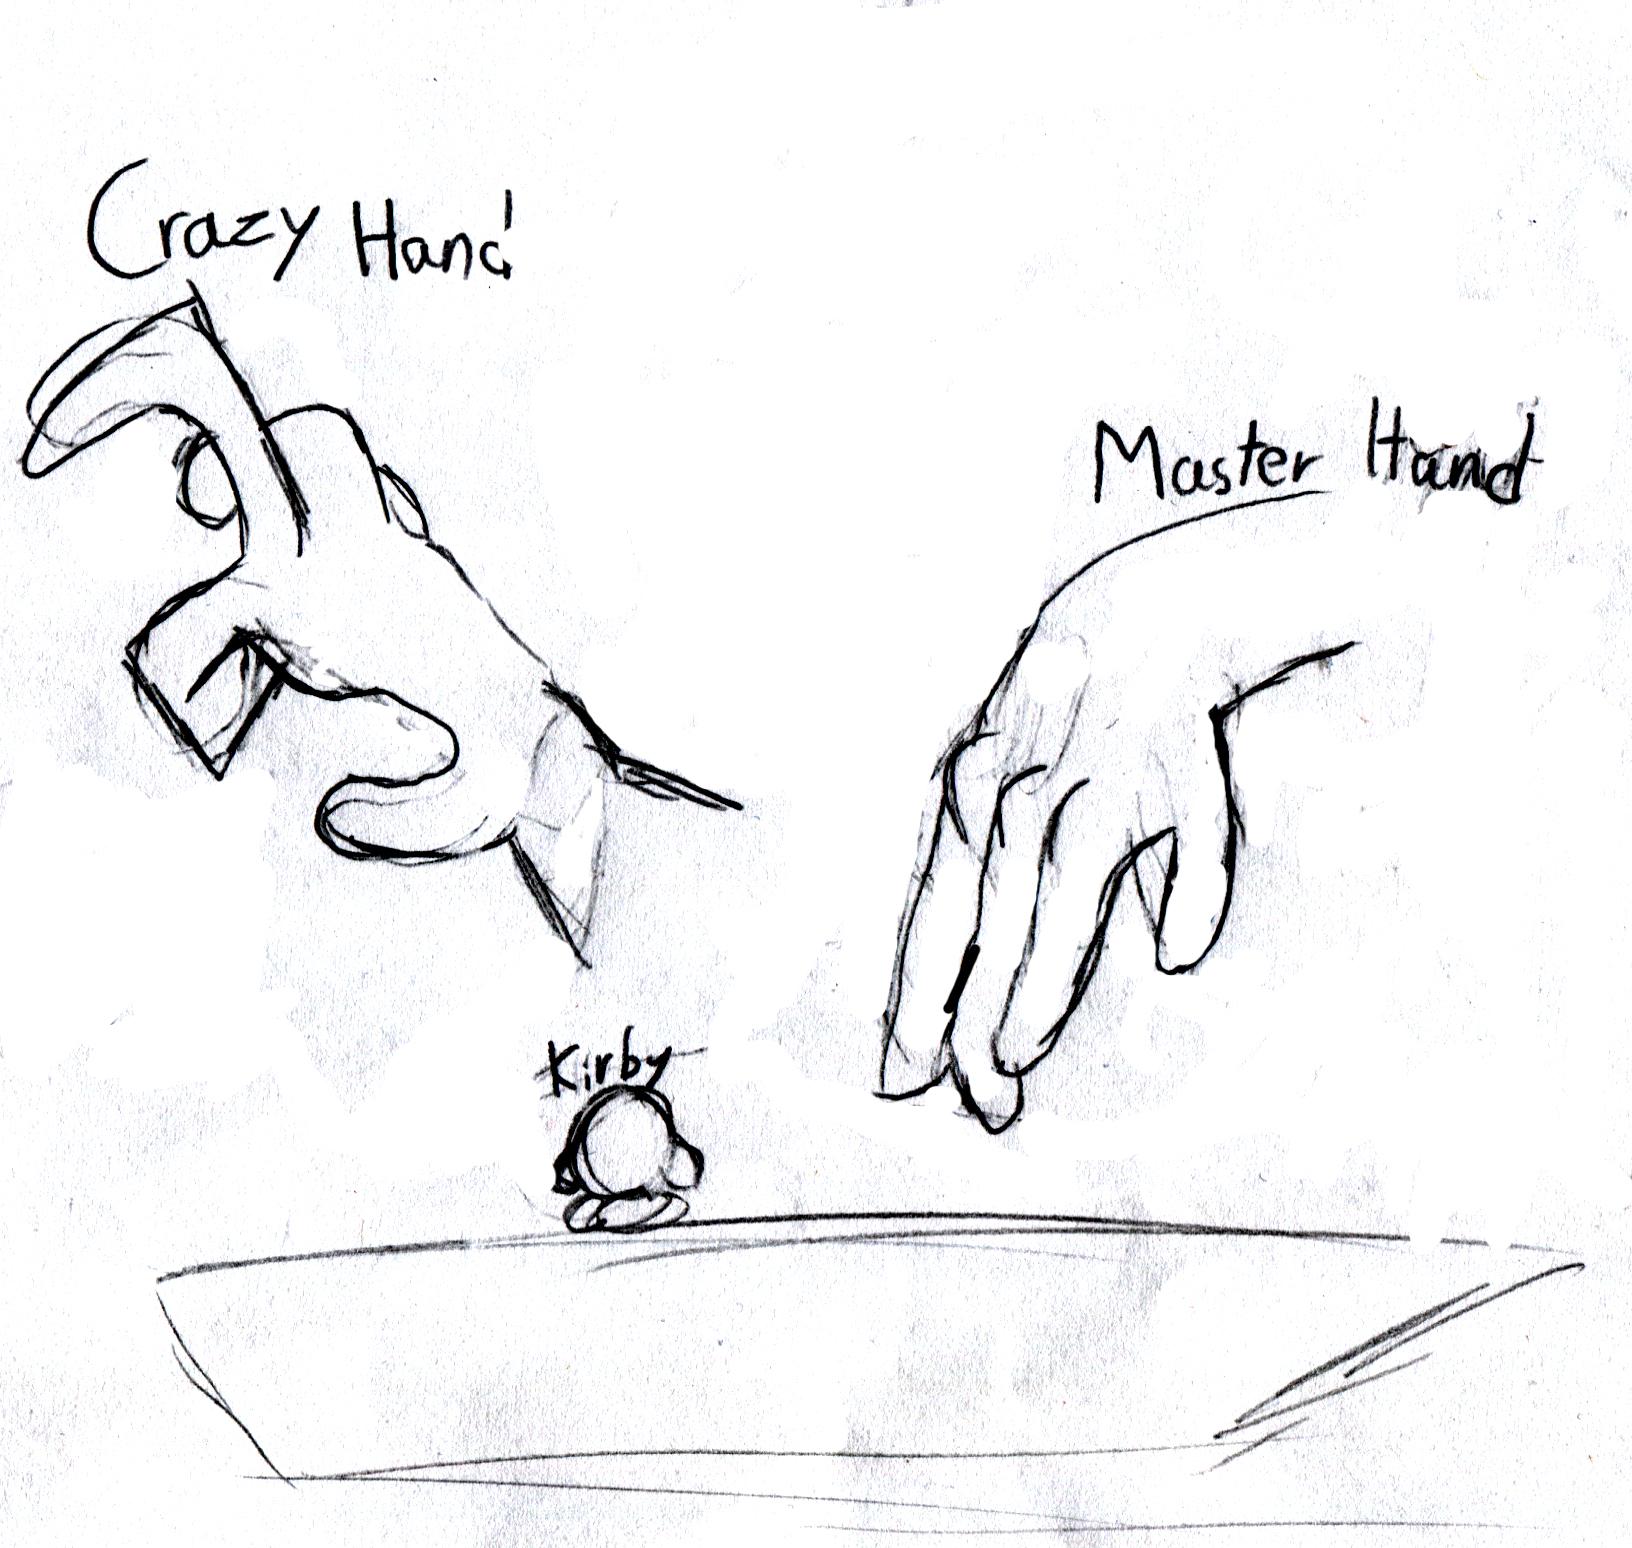 Crazy and Master Hand Cutscene